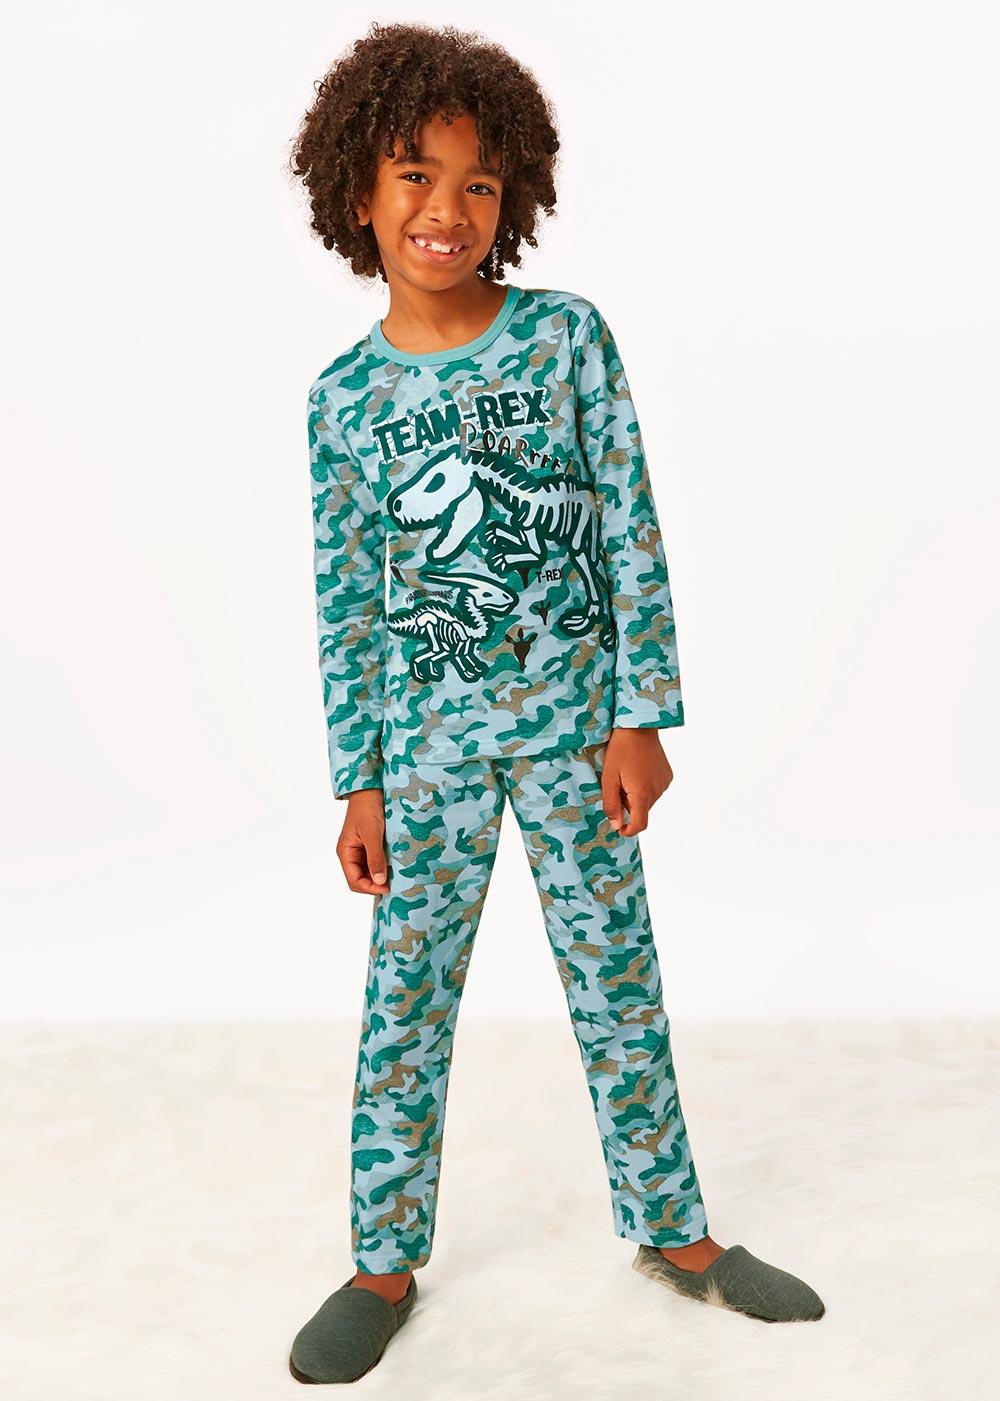 Pijama Infantil Masculino Inverno Verde Team Rex - Malwee